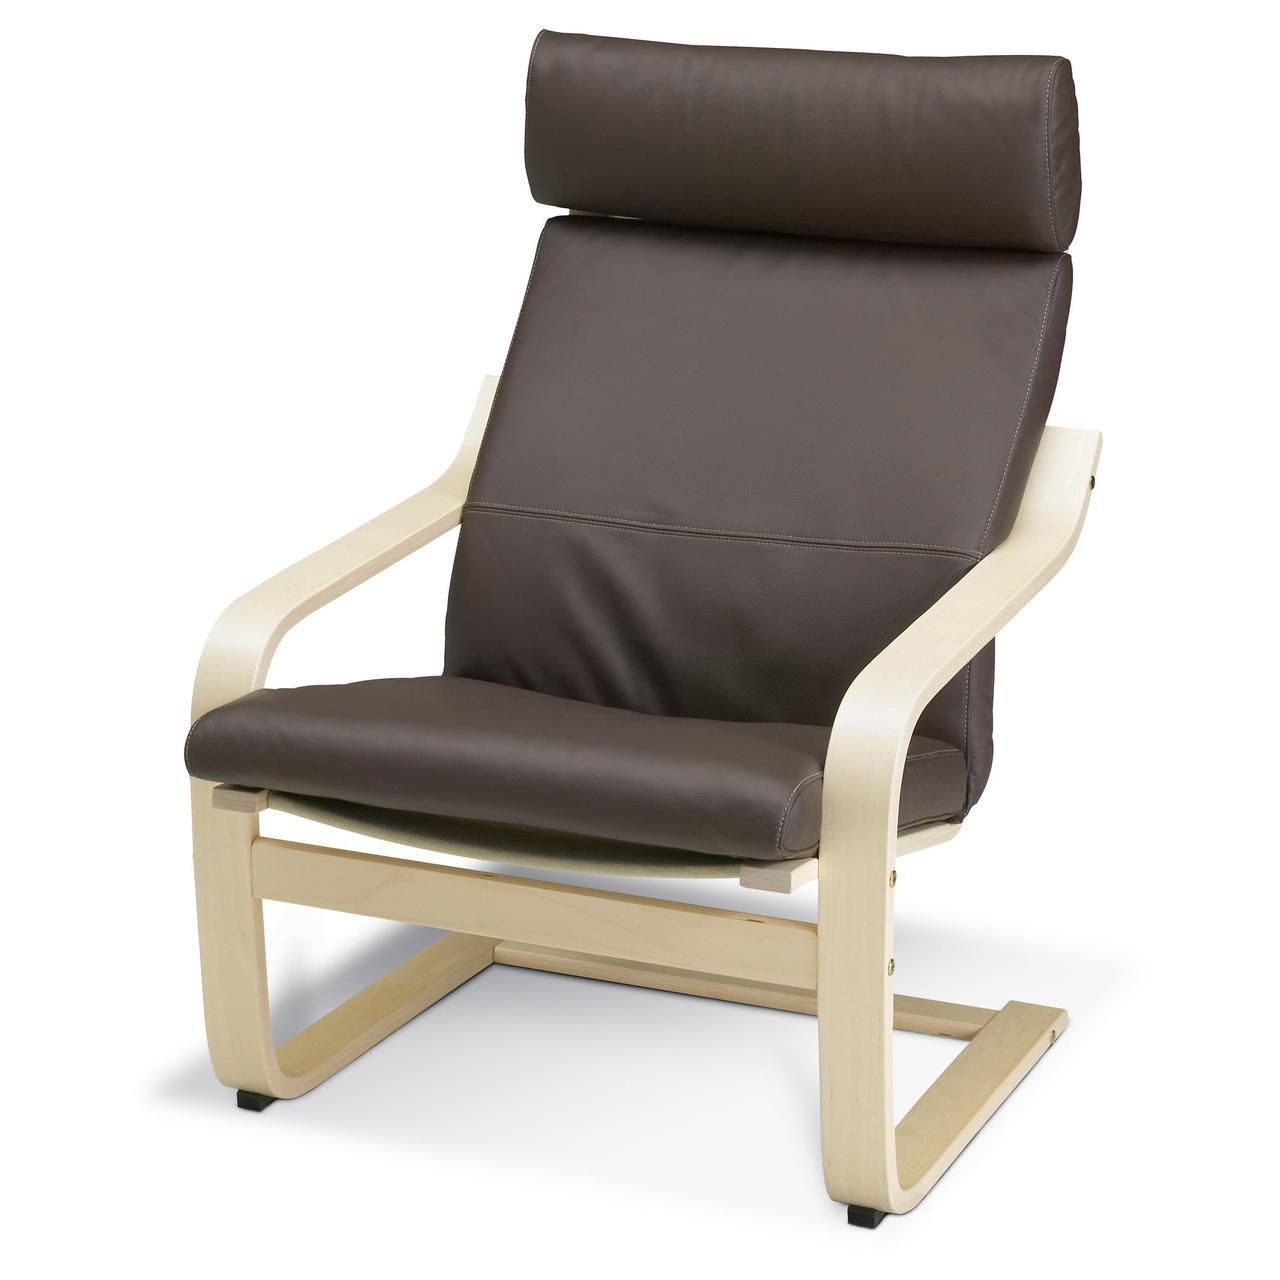 IKEA POANG (898.291.19) Кресло, ok birches, Прочный Glose ecru